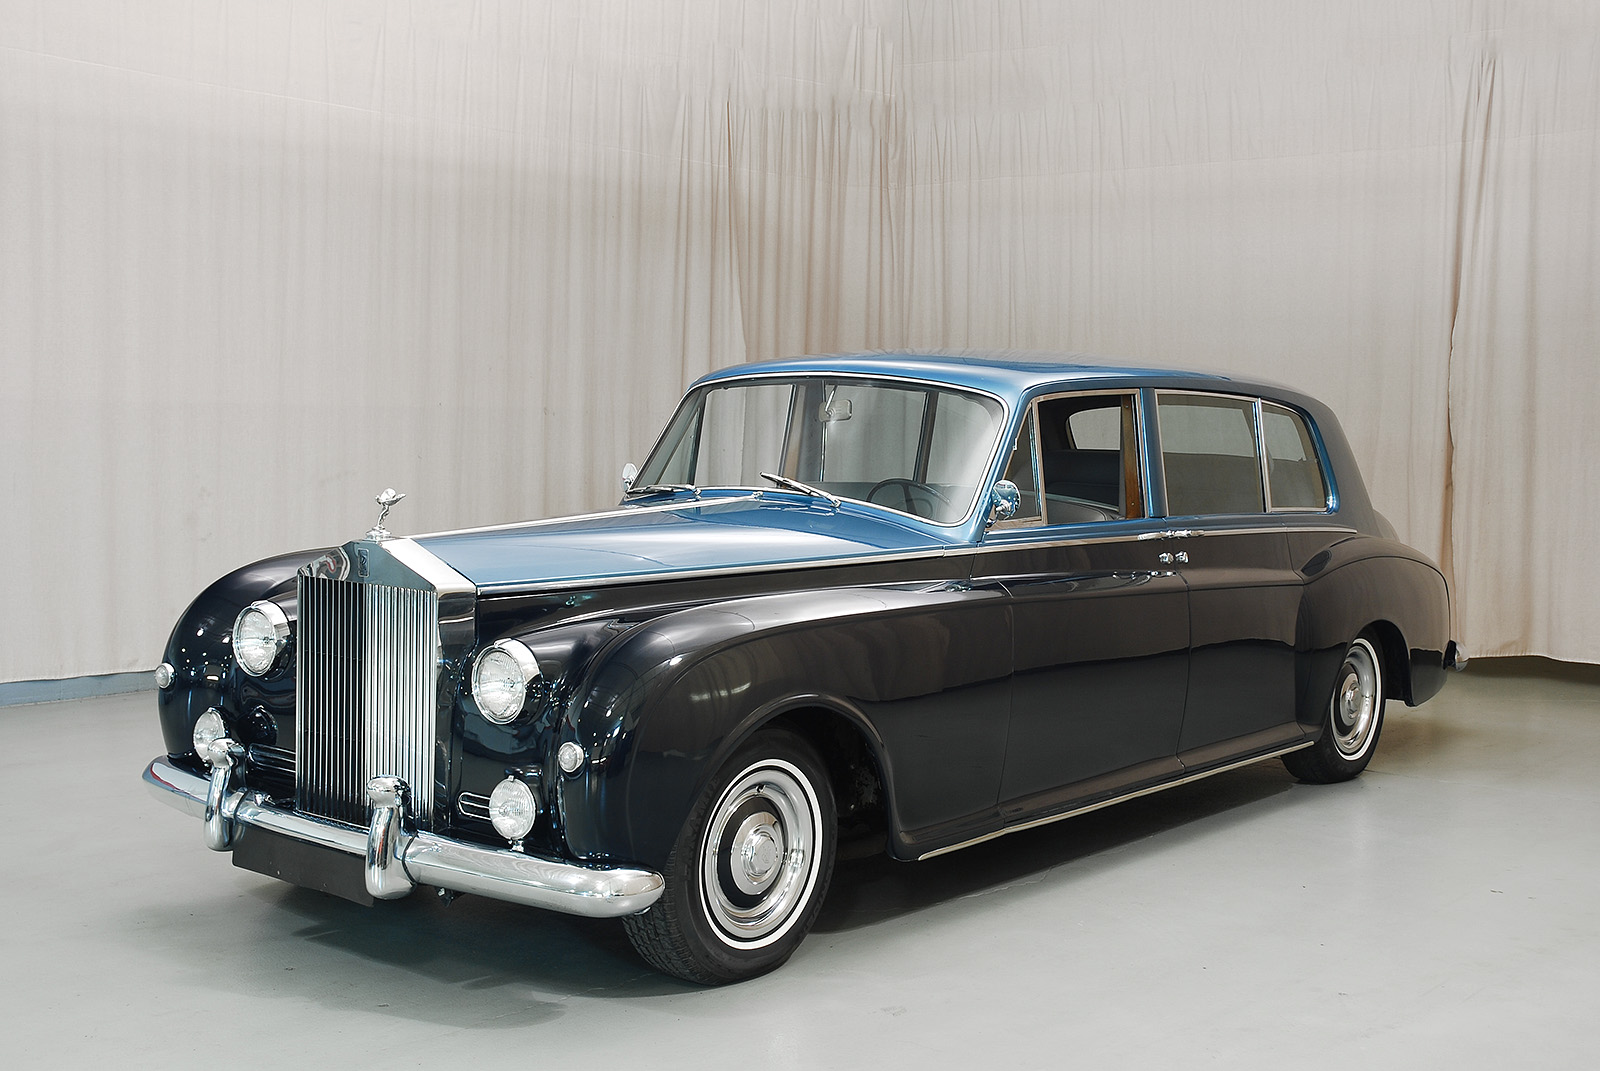 Rolls Royce Limo >> 1962 Rolls-Royce Phantom V Limo - Hyman Ltd. Classic Cars